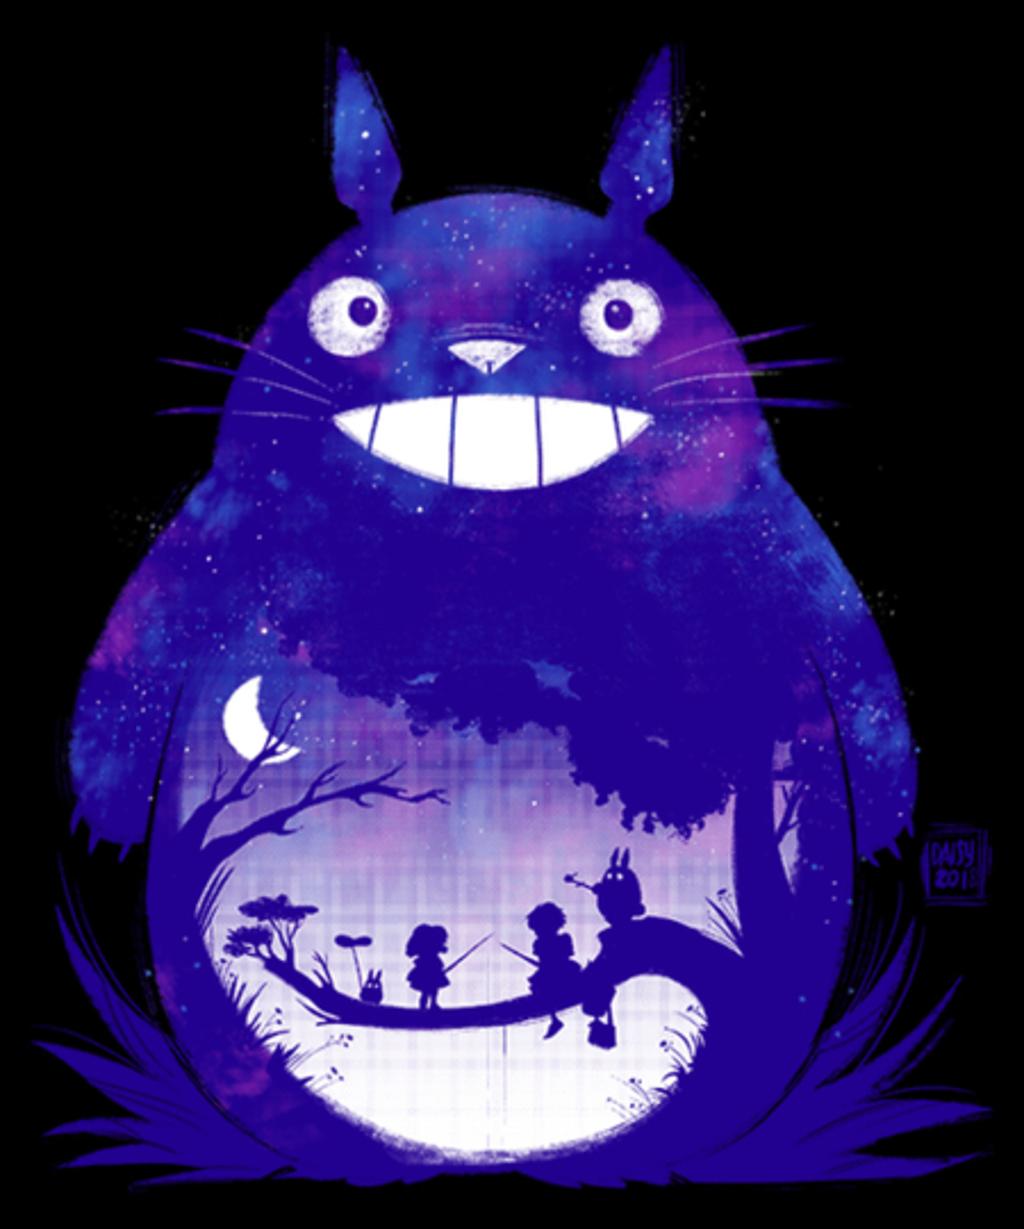 Qwertee: Starry Totoro